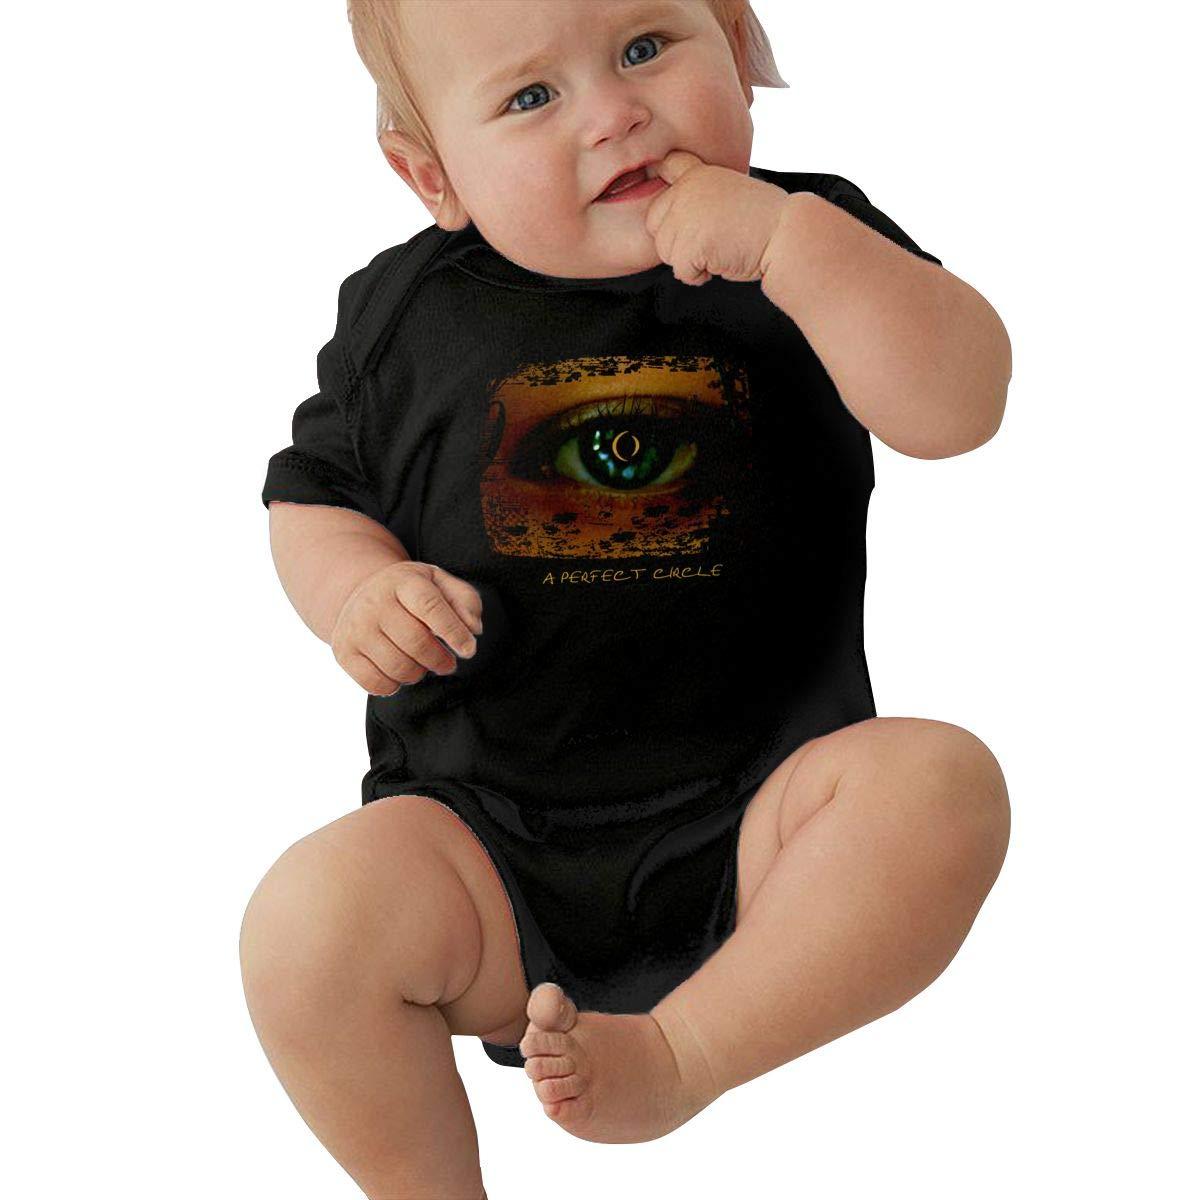 Joseph E Hinton A Perfect Circle Unisex Cute Infant Bodysuit Baby Romper Shirt for 0-24 Months